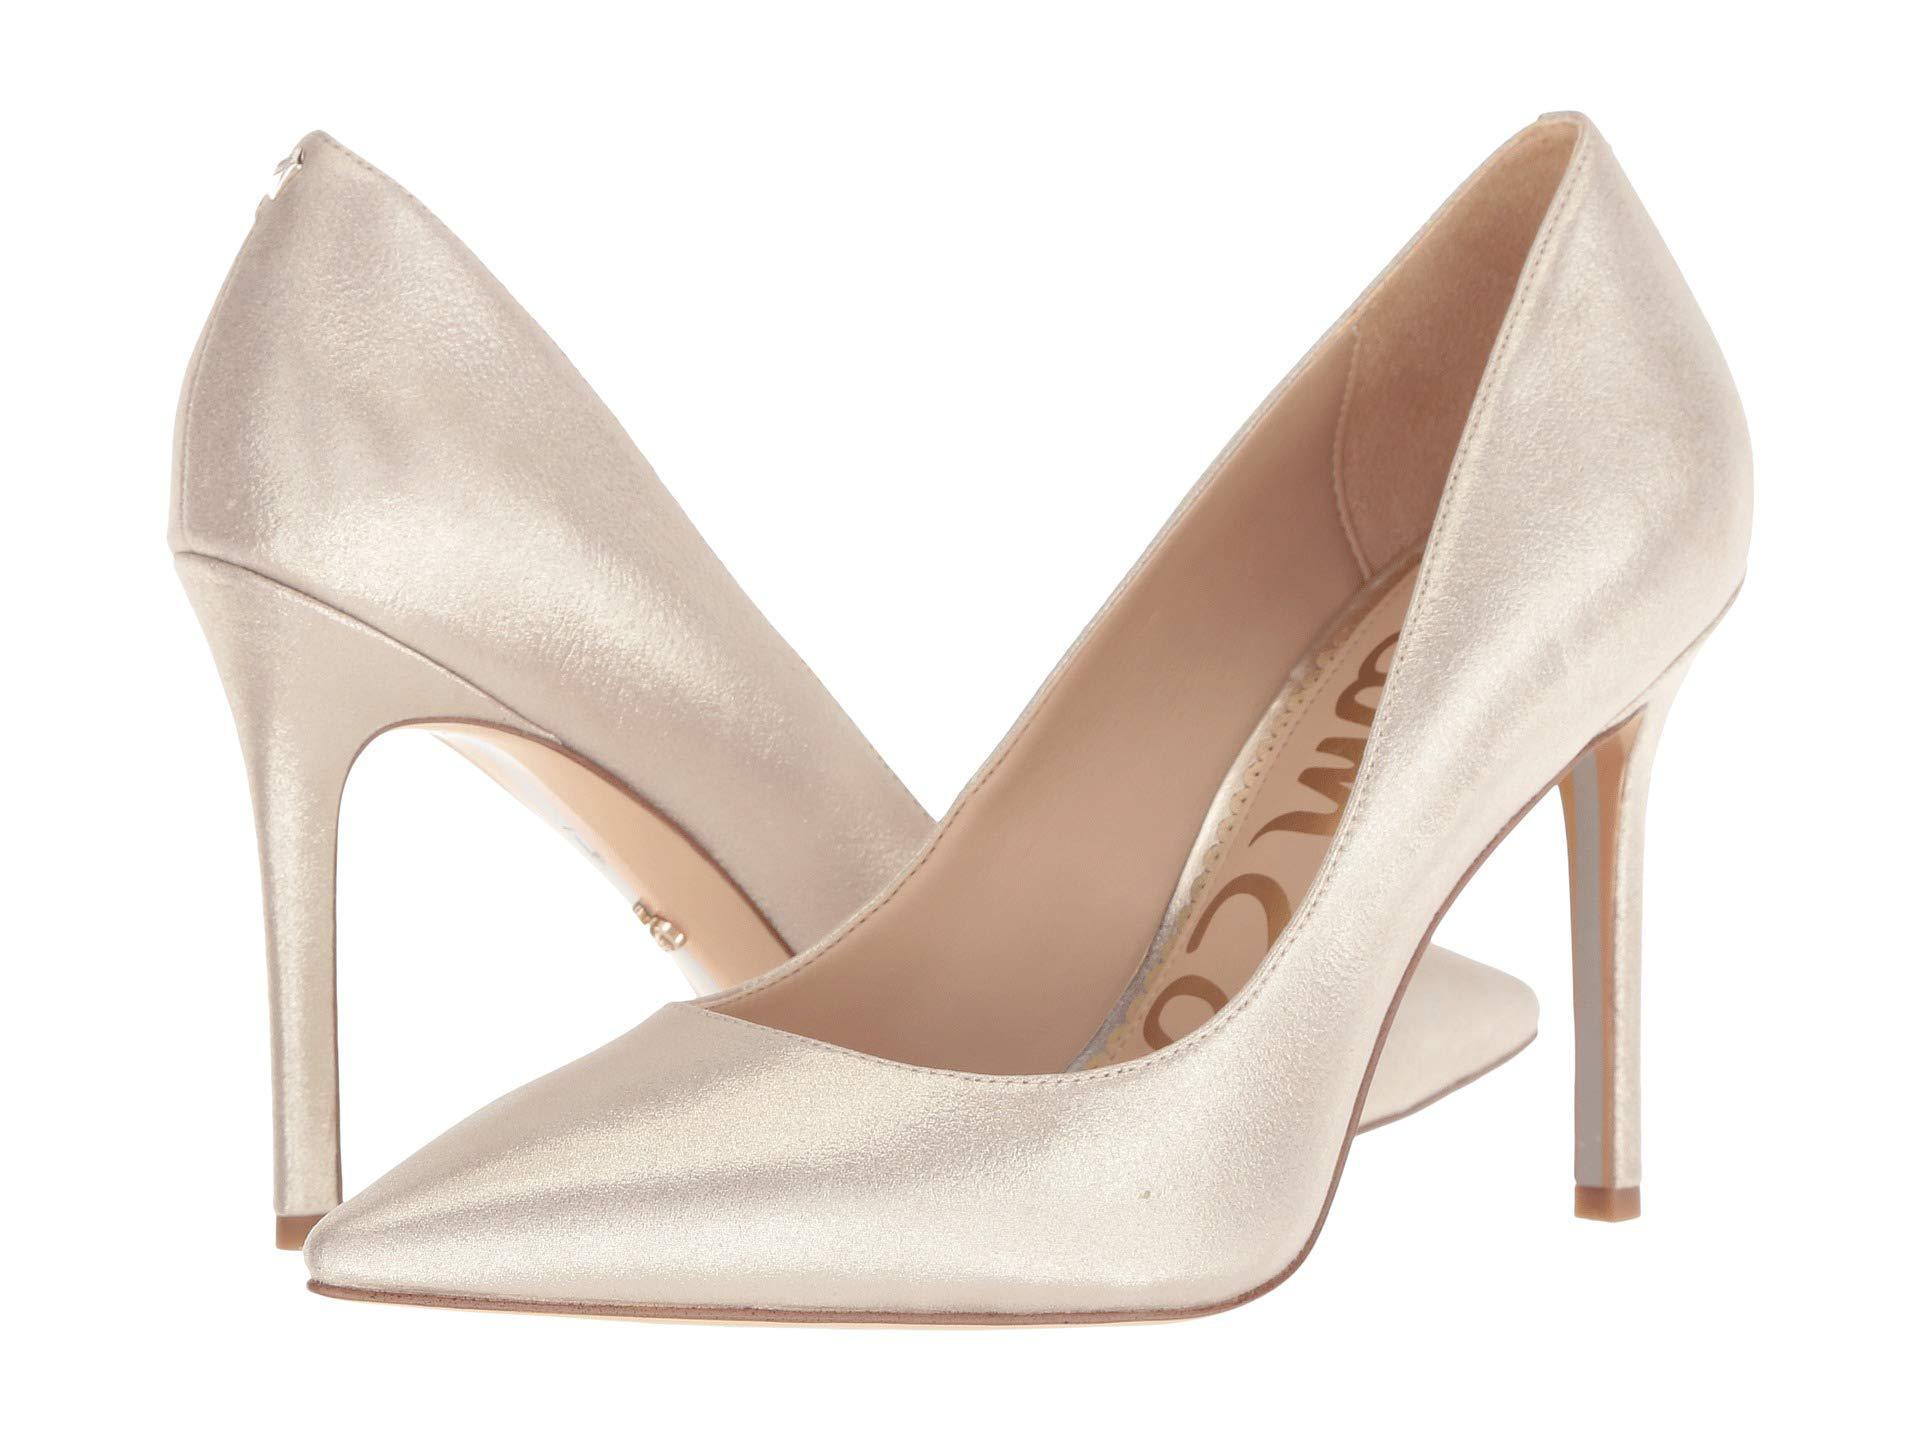 05c26241010 Lyst - Sam Edelman Hazel (gold Degrade Crystal Patent) Women s Shoes